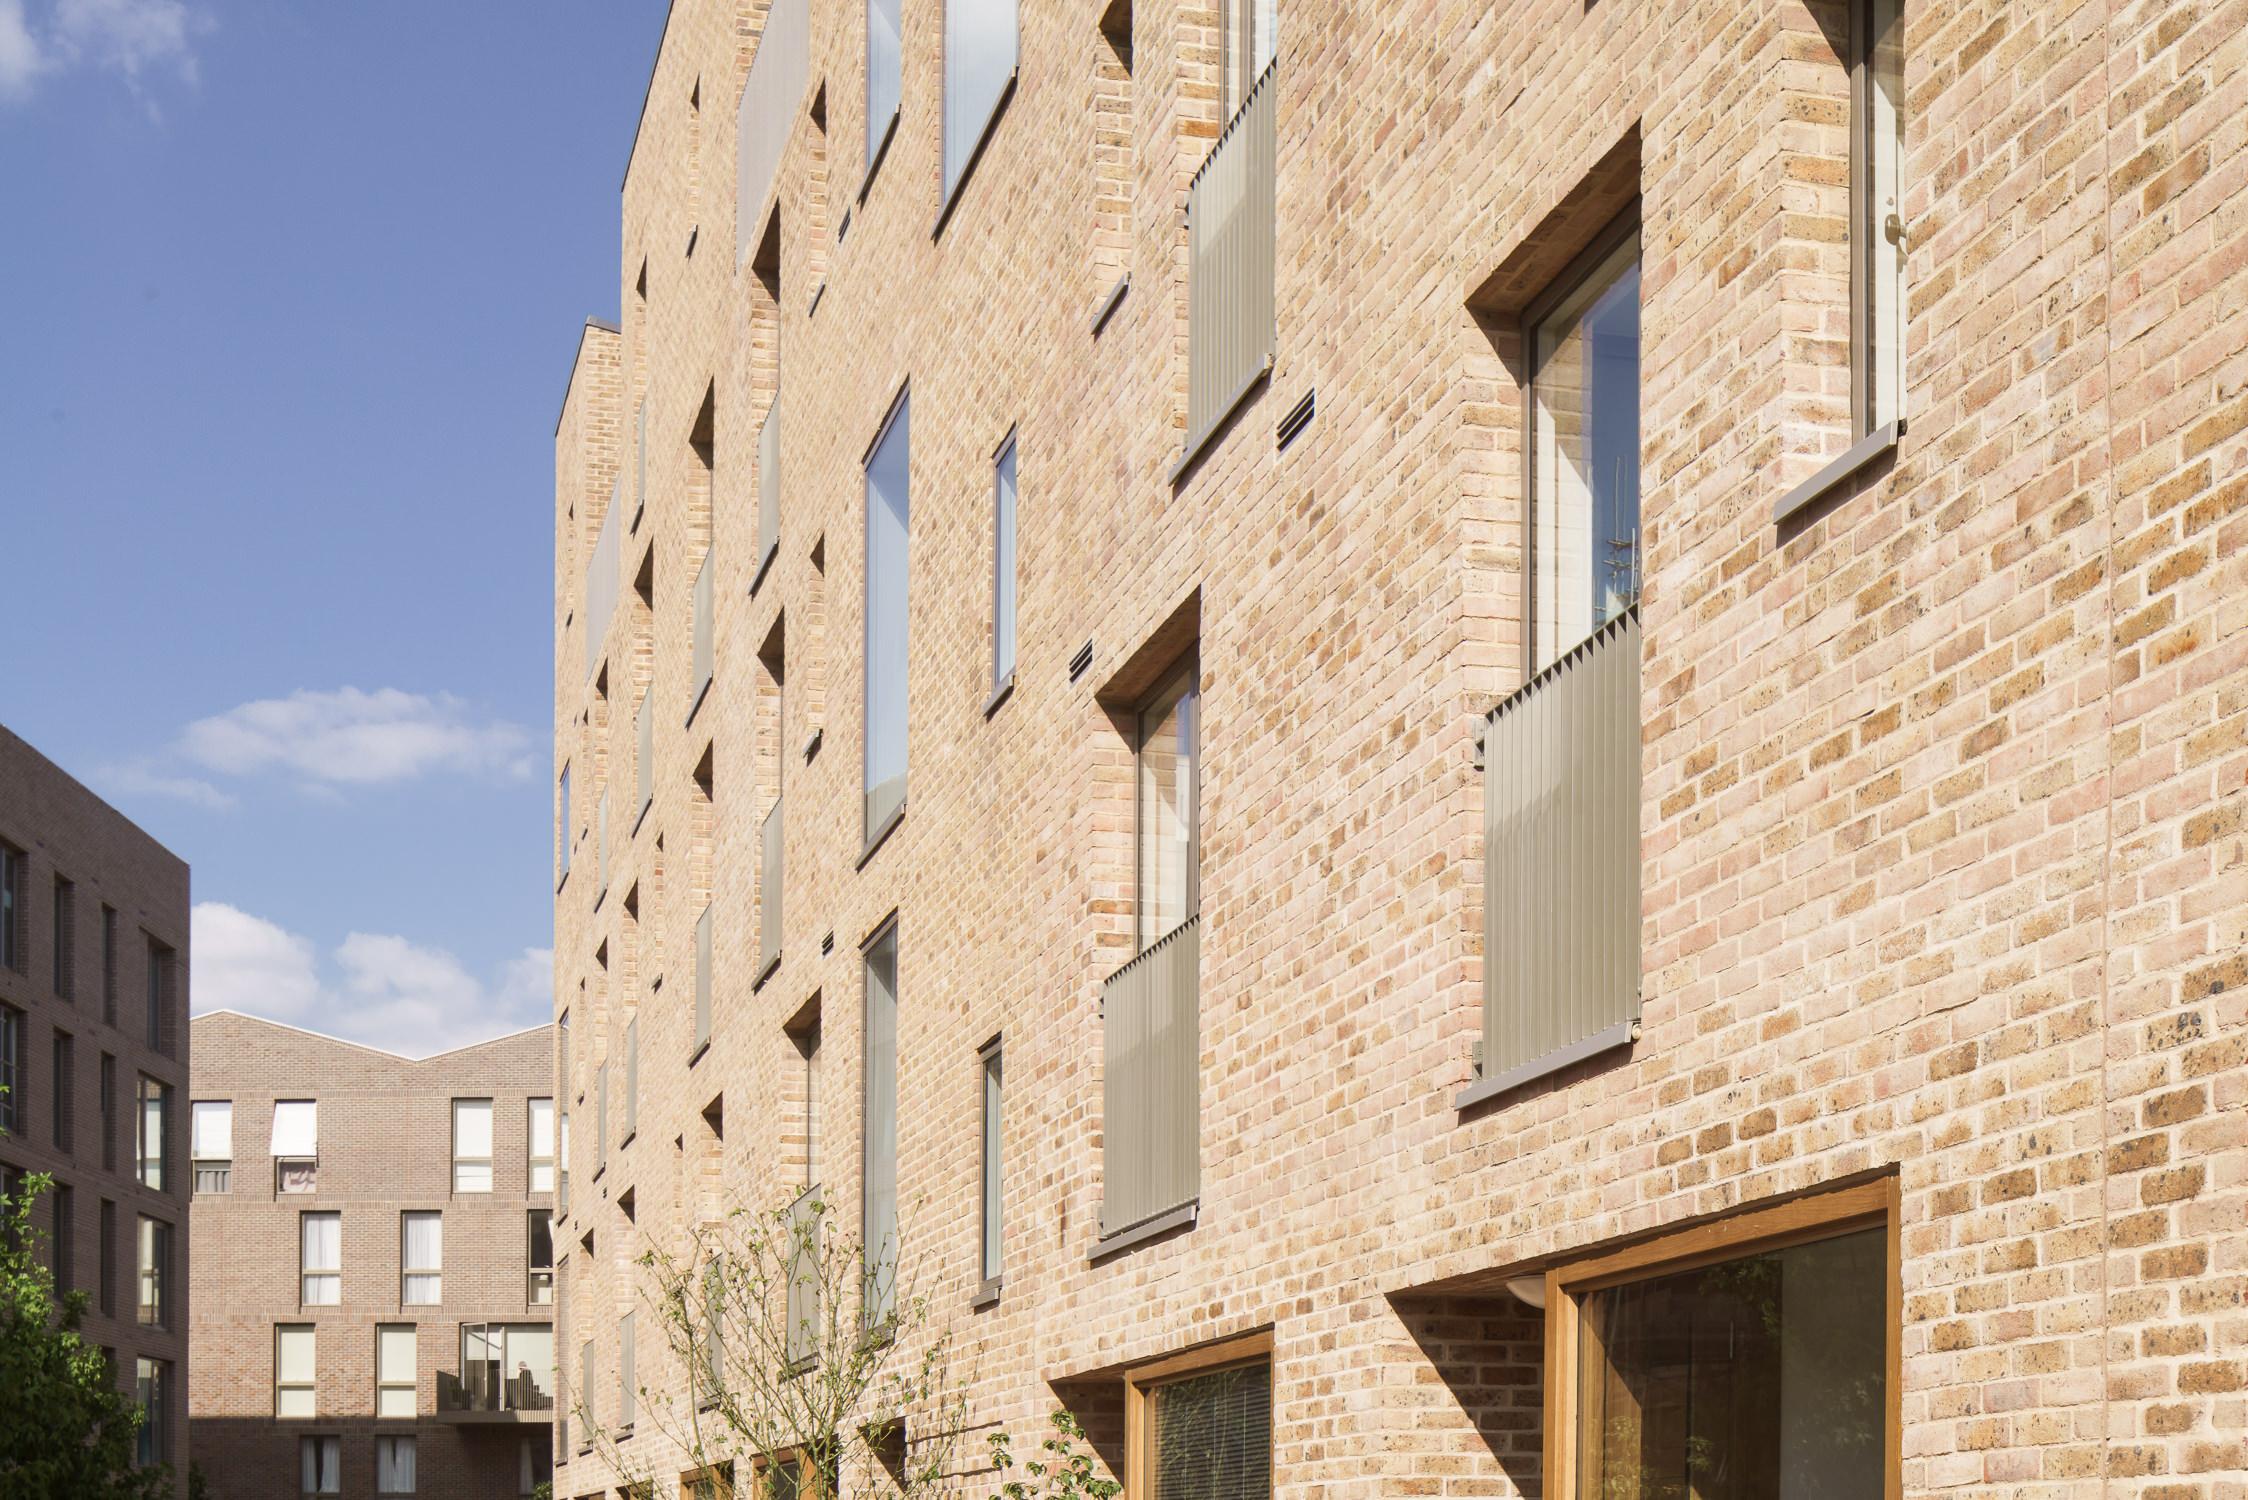 mark-hadden-architecture-photographer-architectuur-interieur-fotografie-london-amsterdam-MIkhail Riches June 2015 © MH-008-Edit.jpg